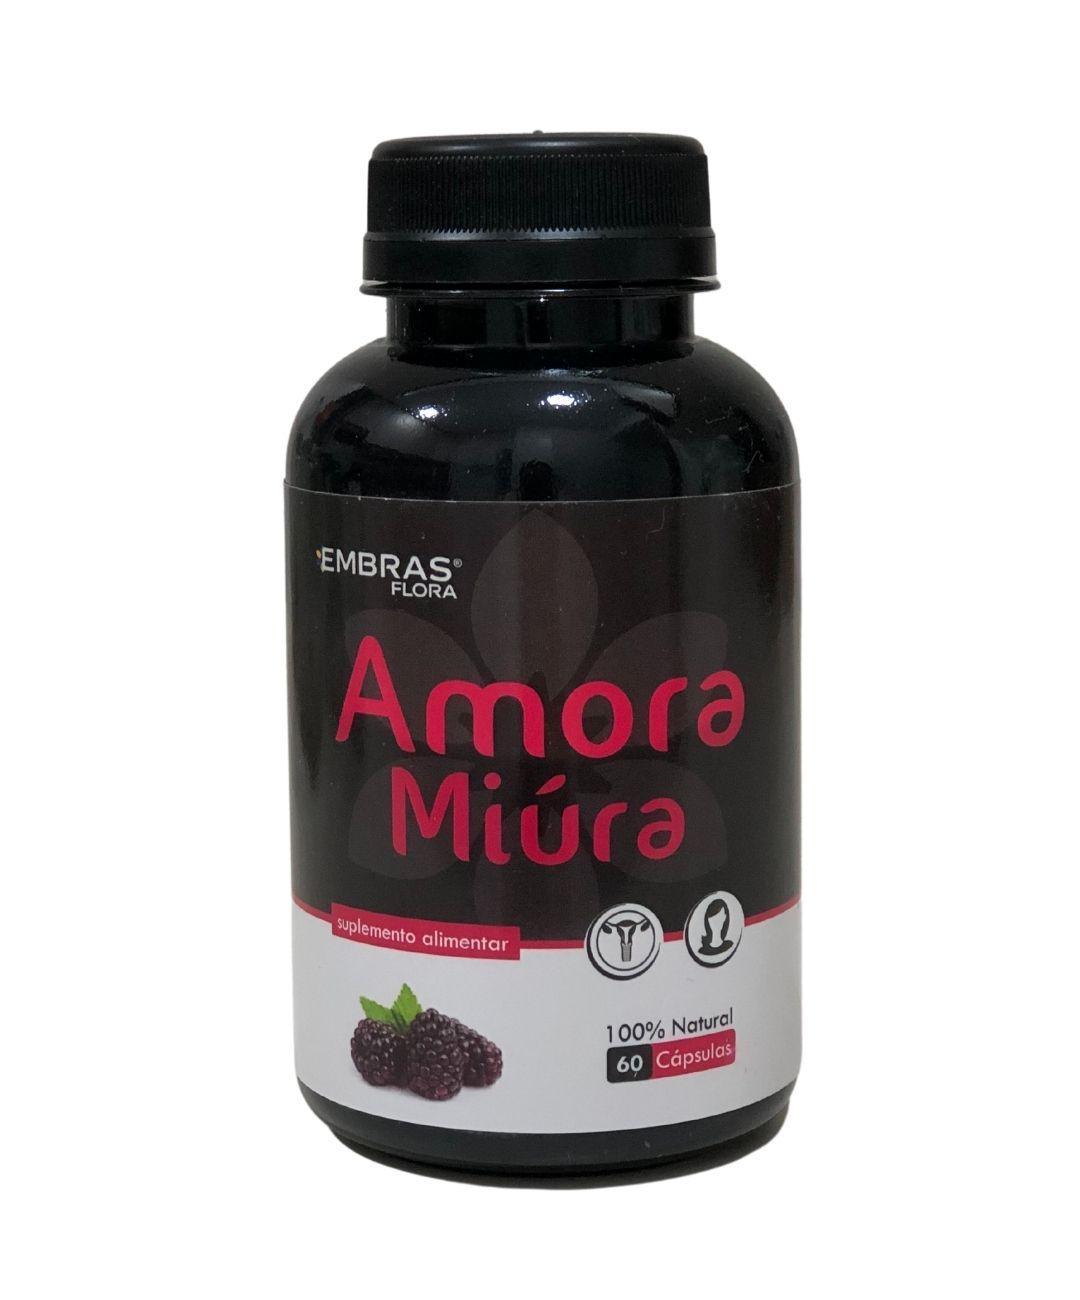 AMORA MIÚRA 60 CÁPSULAS - EMBRASFLORA